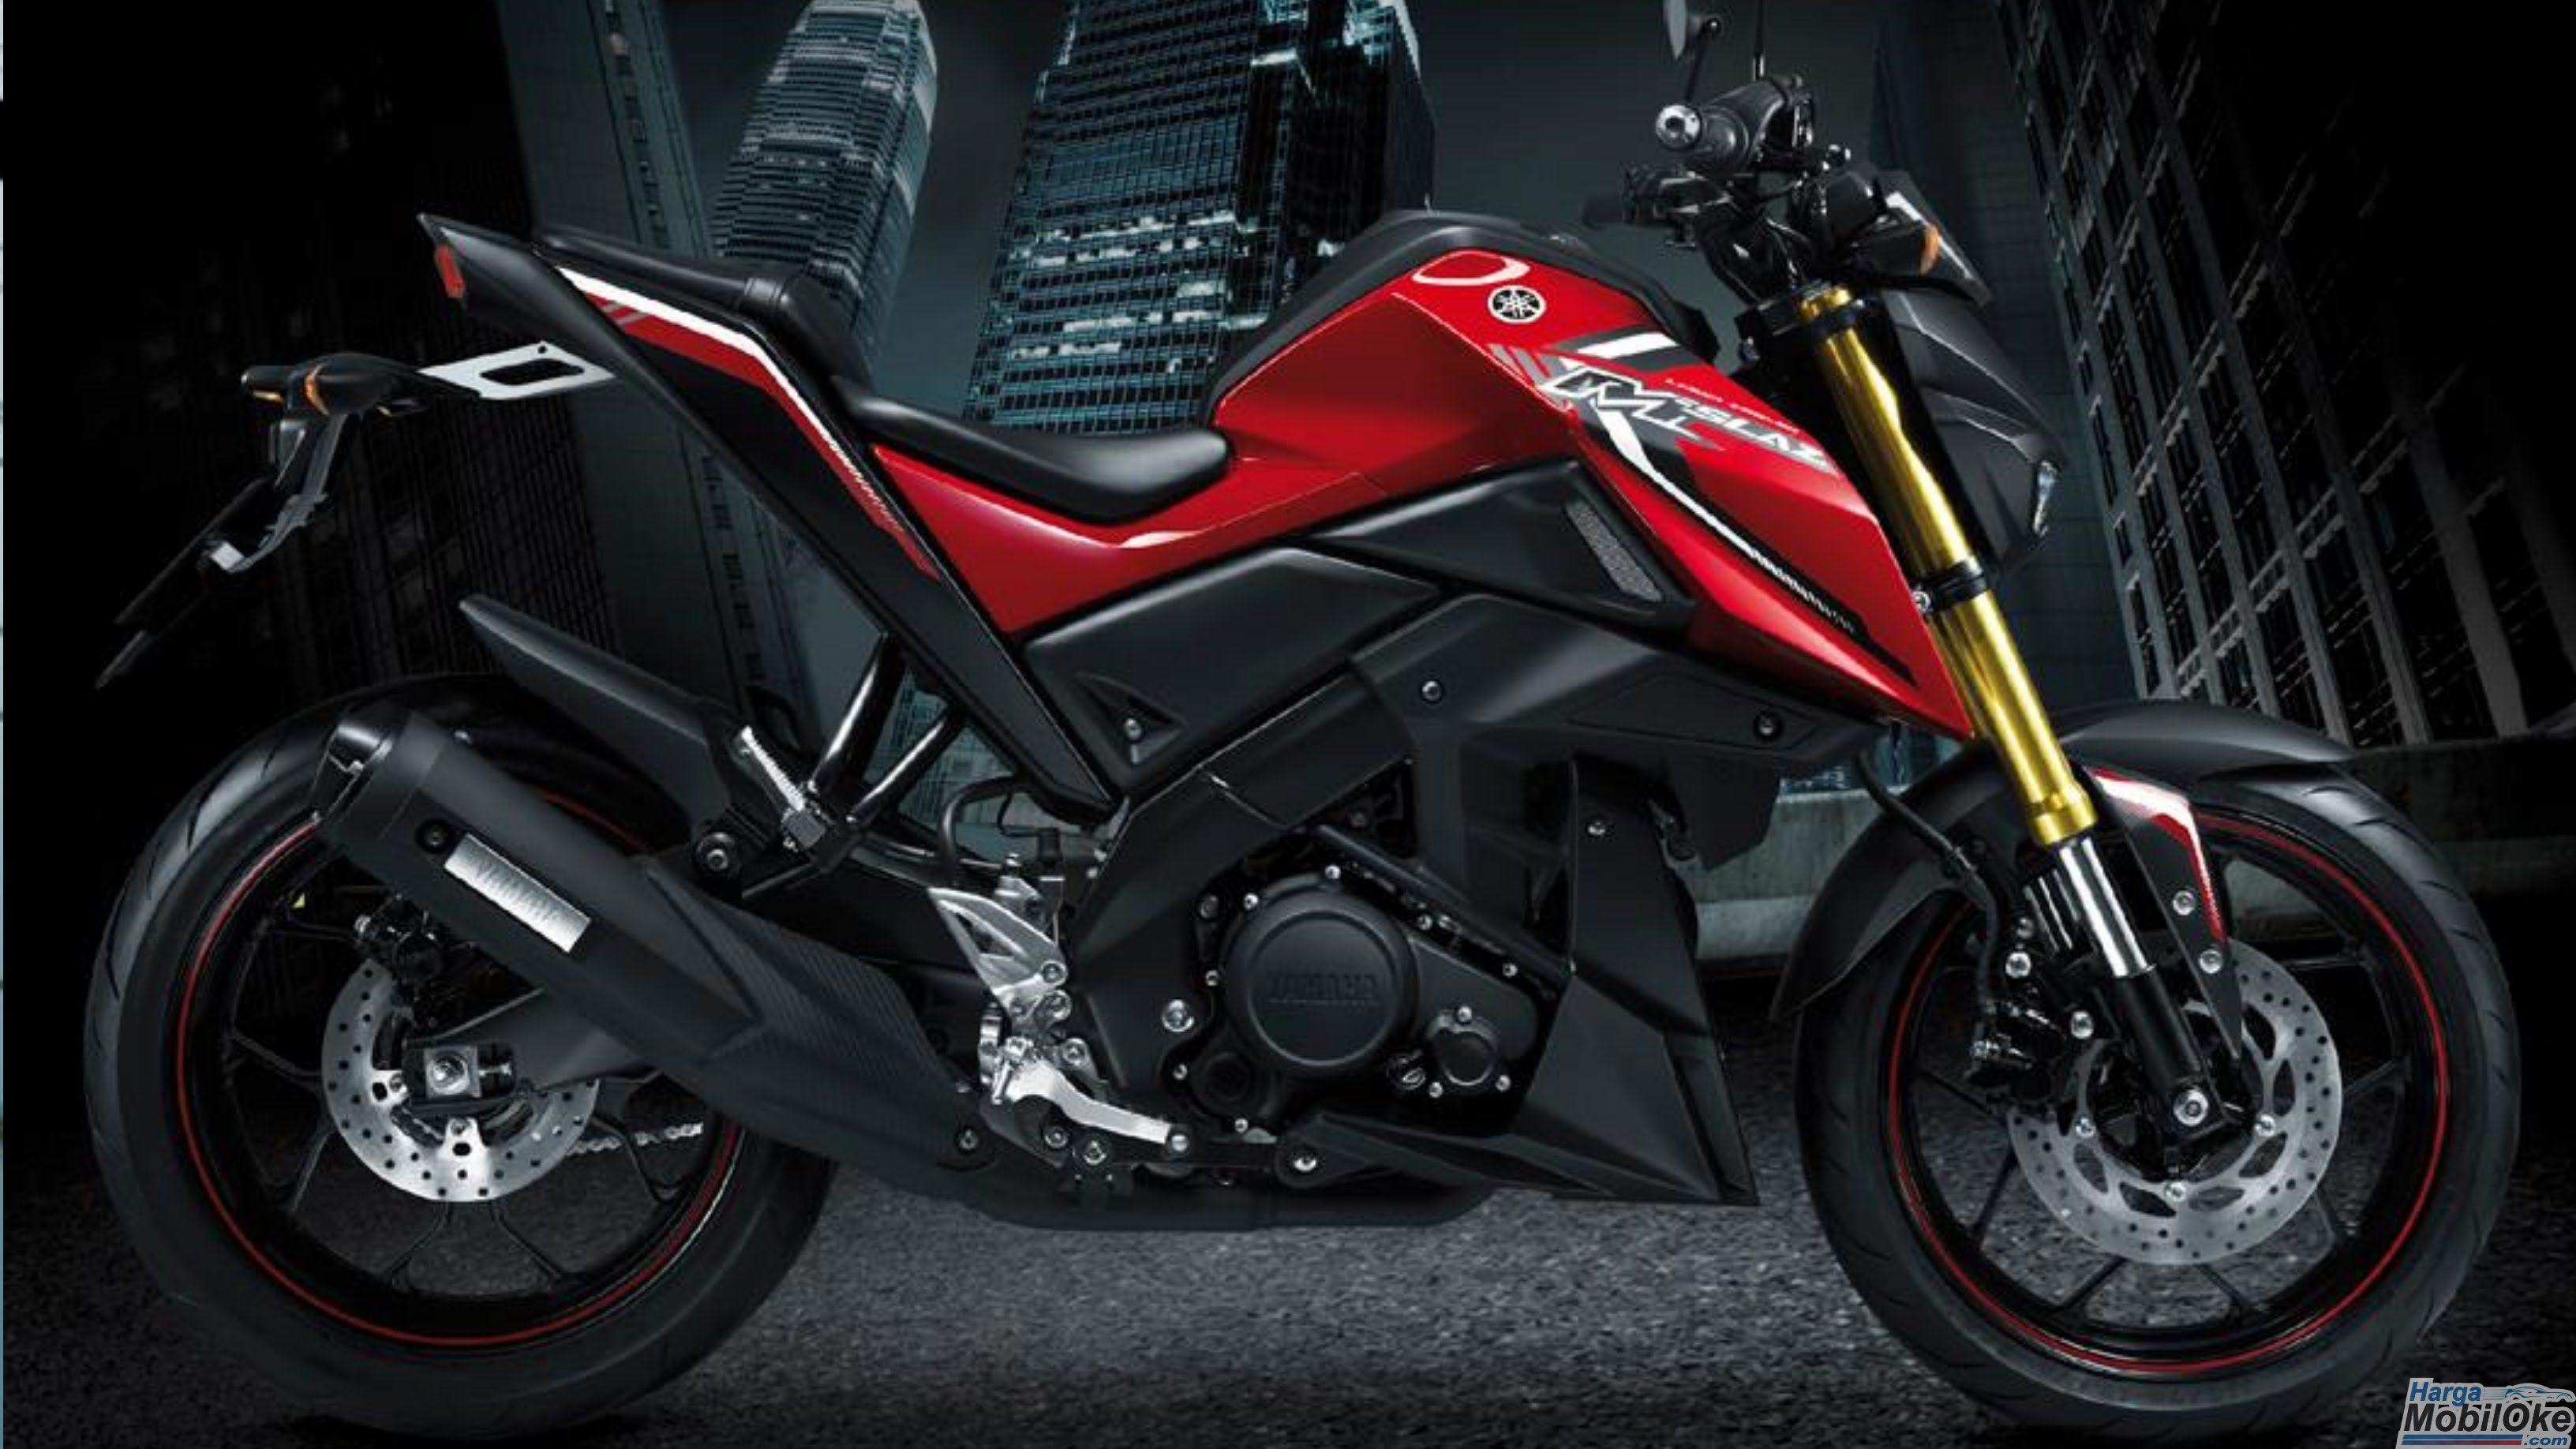 Yamaha Mt 15 Resmi Dirilis Dengan Harga Jual Rp 33 Jutaan